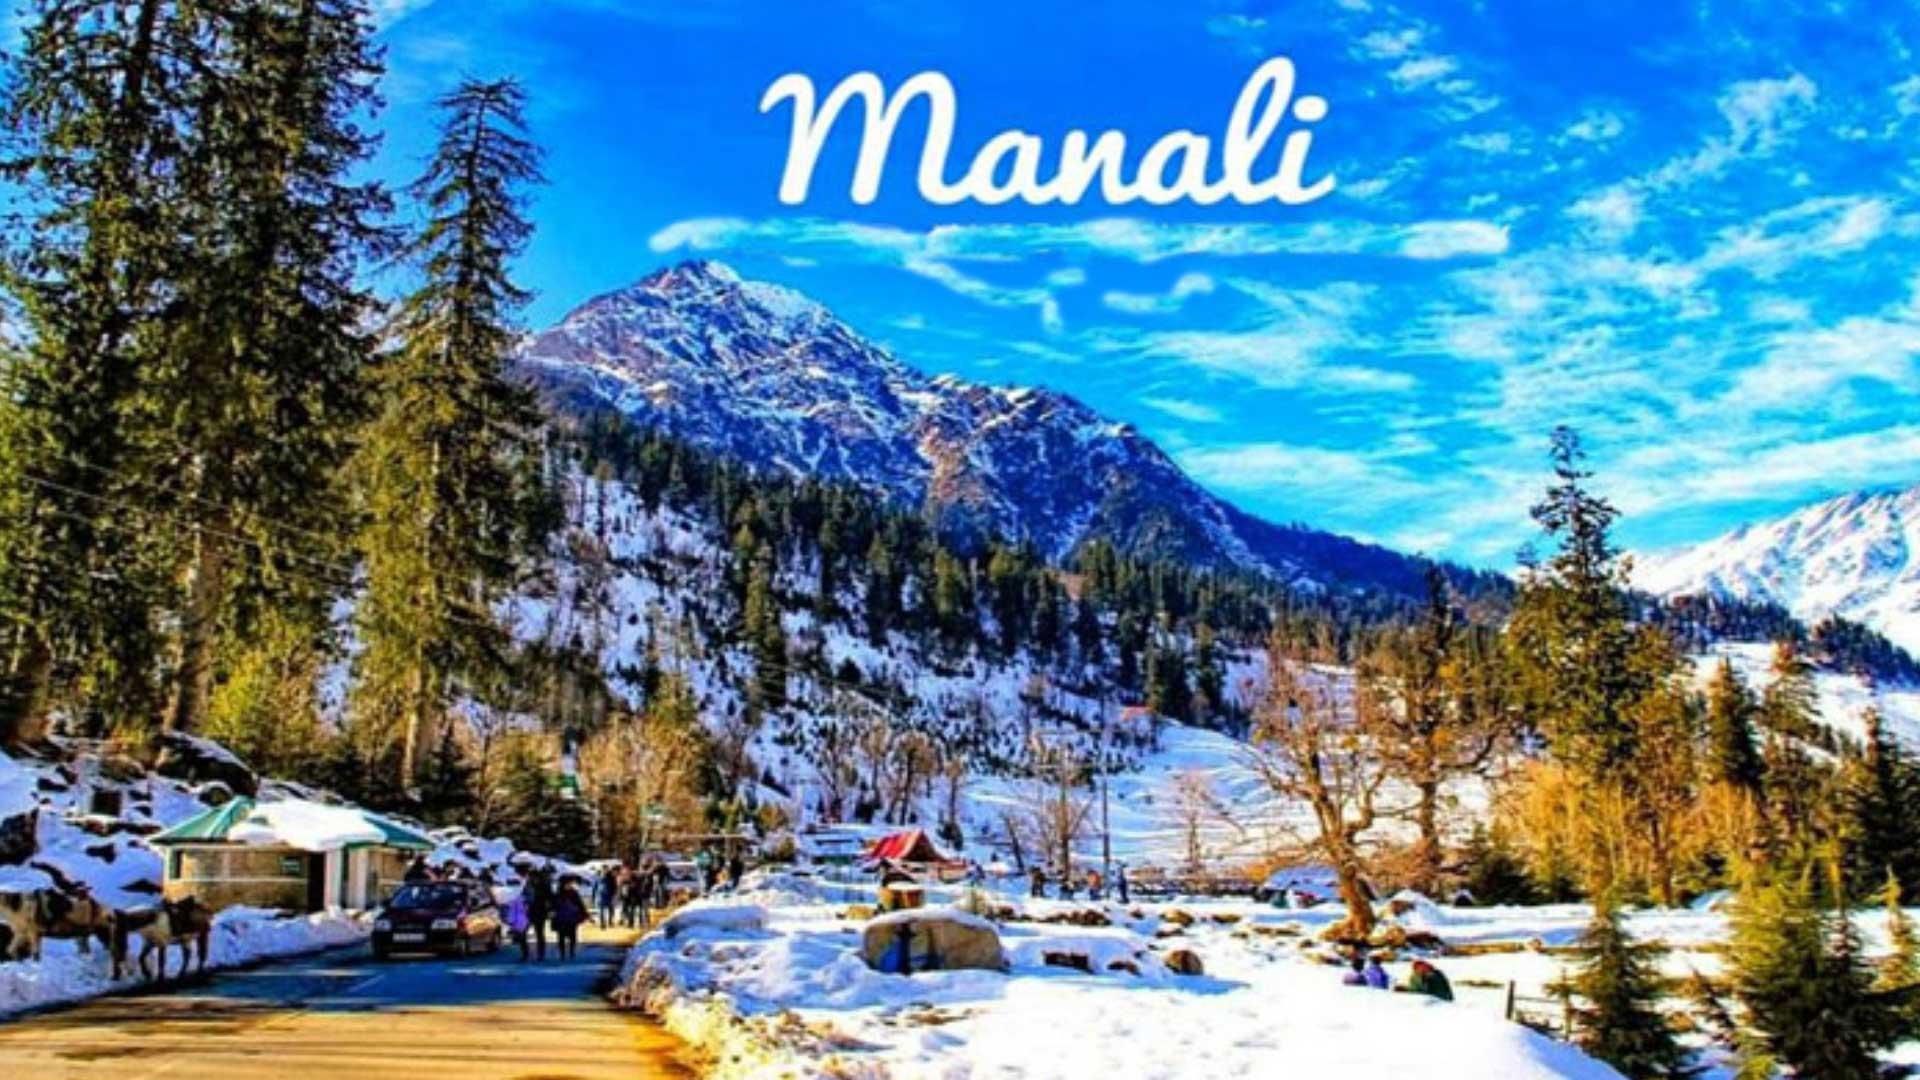 Delhi - Manali 06 Days